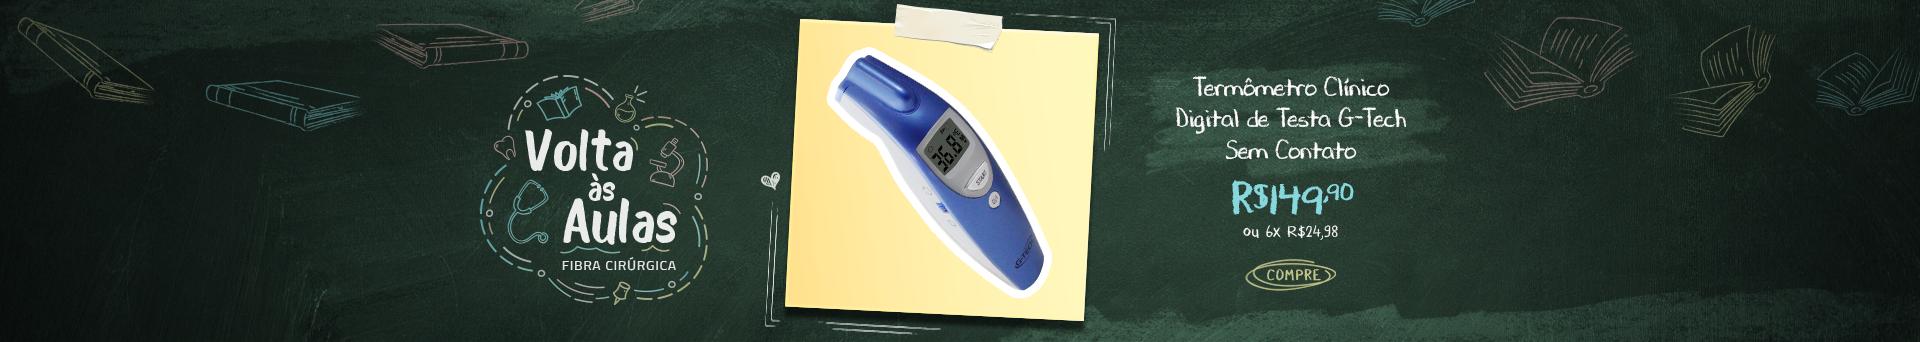 Termometro Gtech